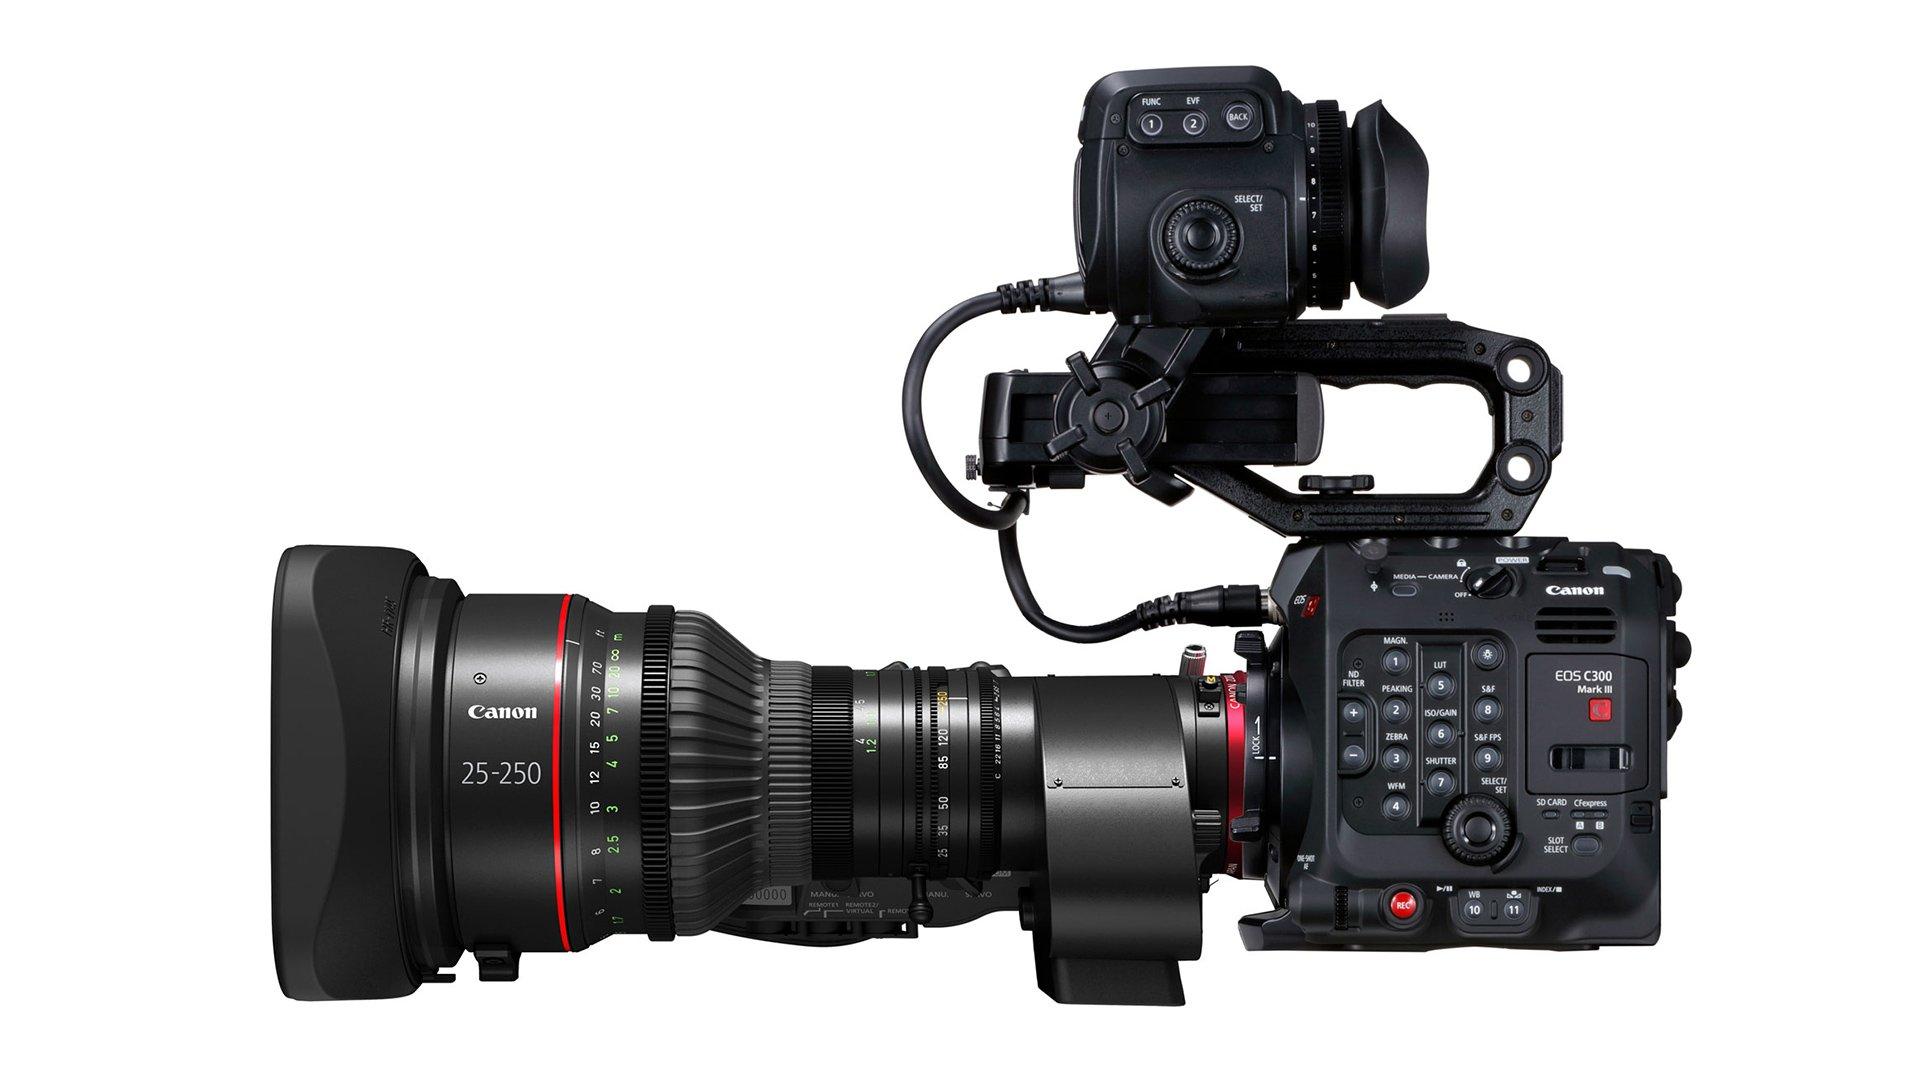 The Canon C300 MkIII